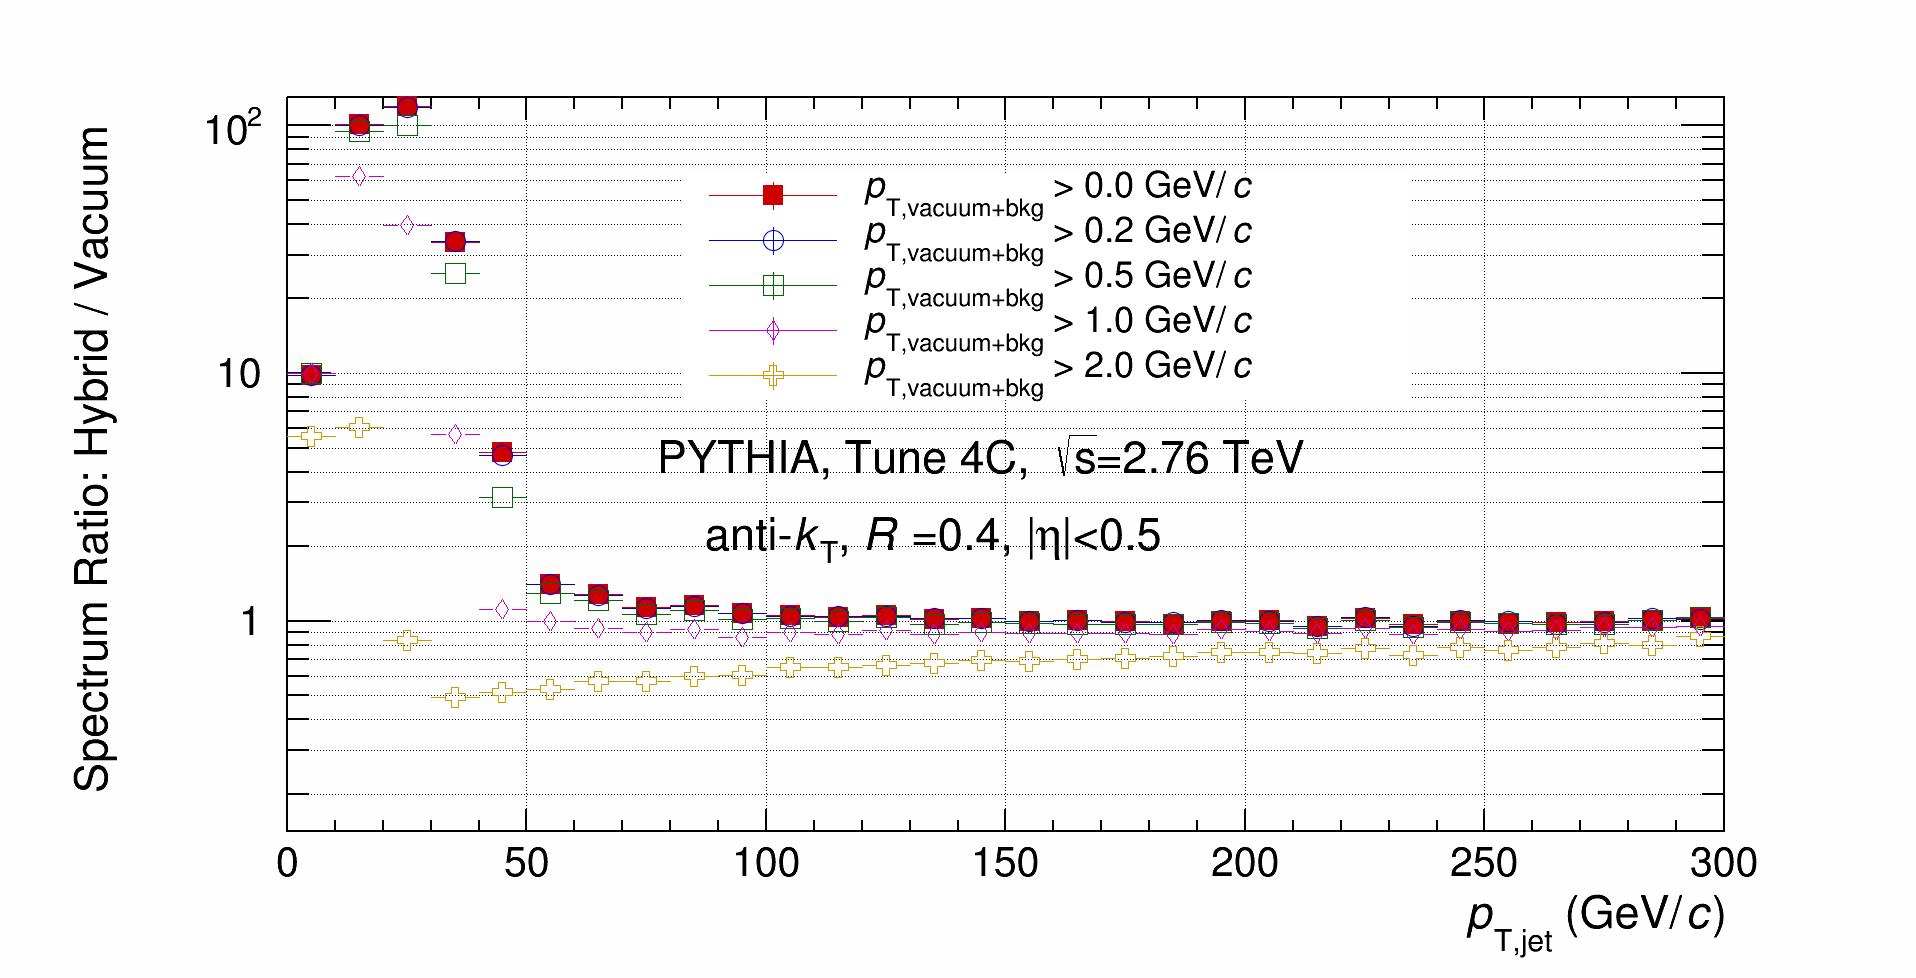 Hybrid_Spectrum_Ratio.png